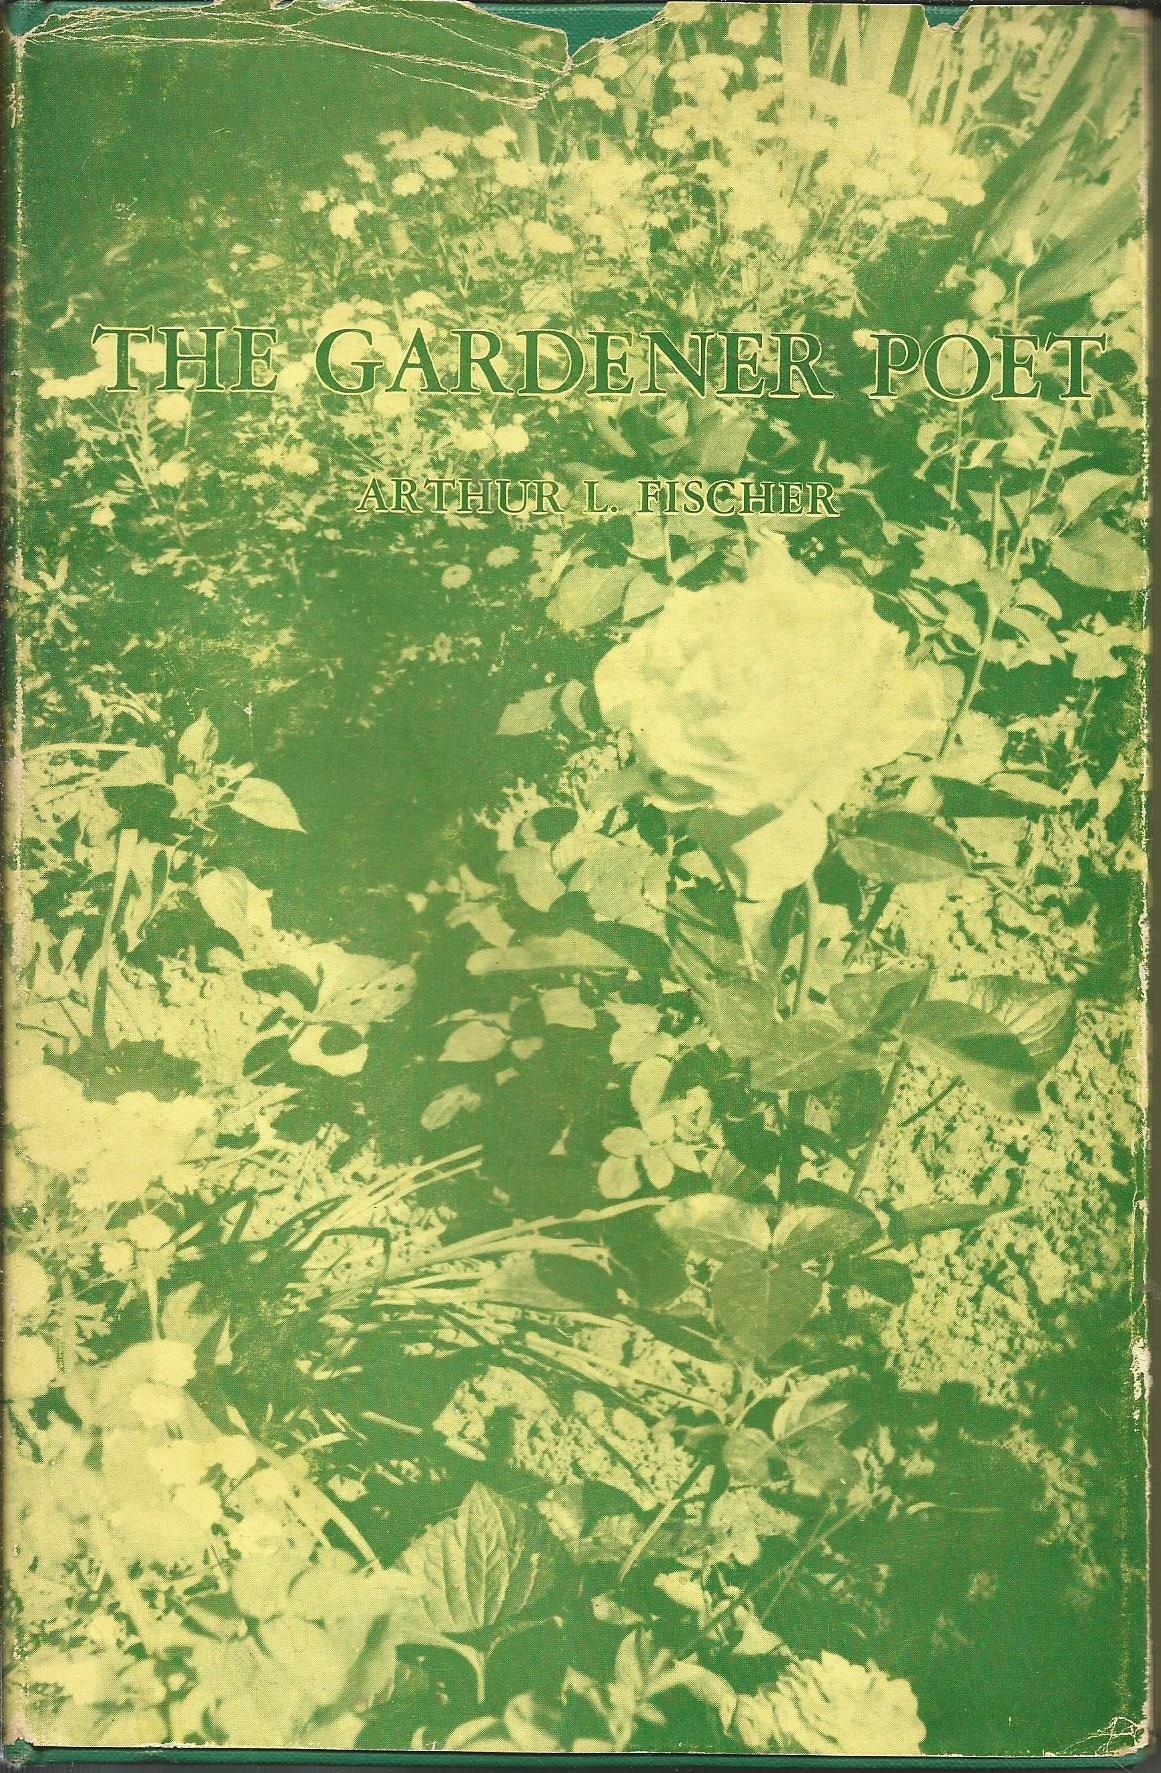 Thr Gardener Poet, Fischer, Arthur L. (Inscribed)